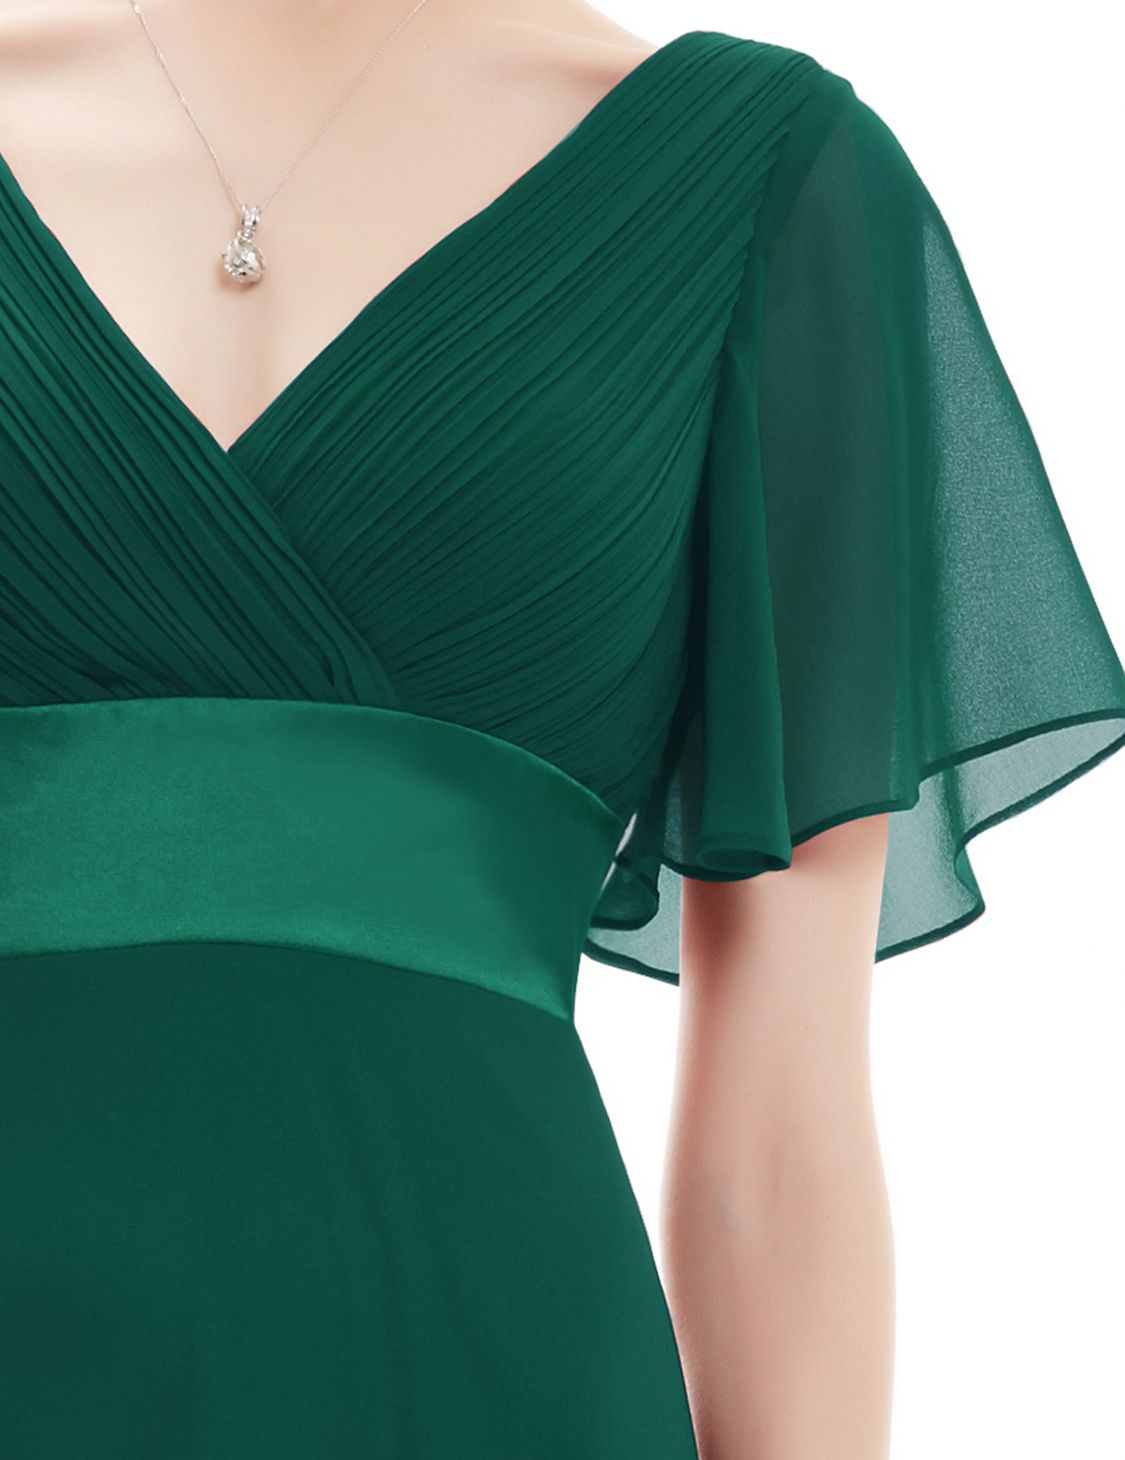 Everpretty bridesmaid dresses short sleeve long mother of bride